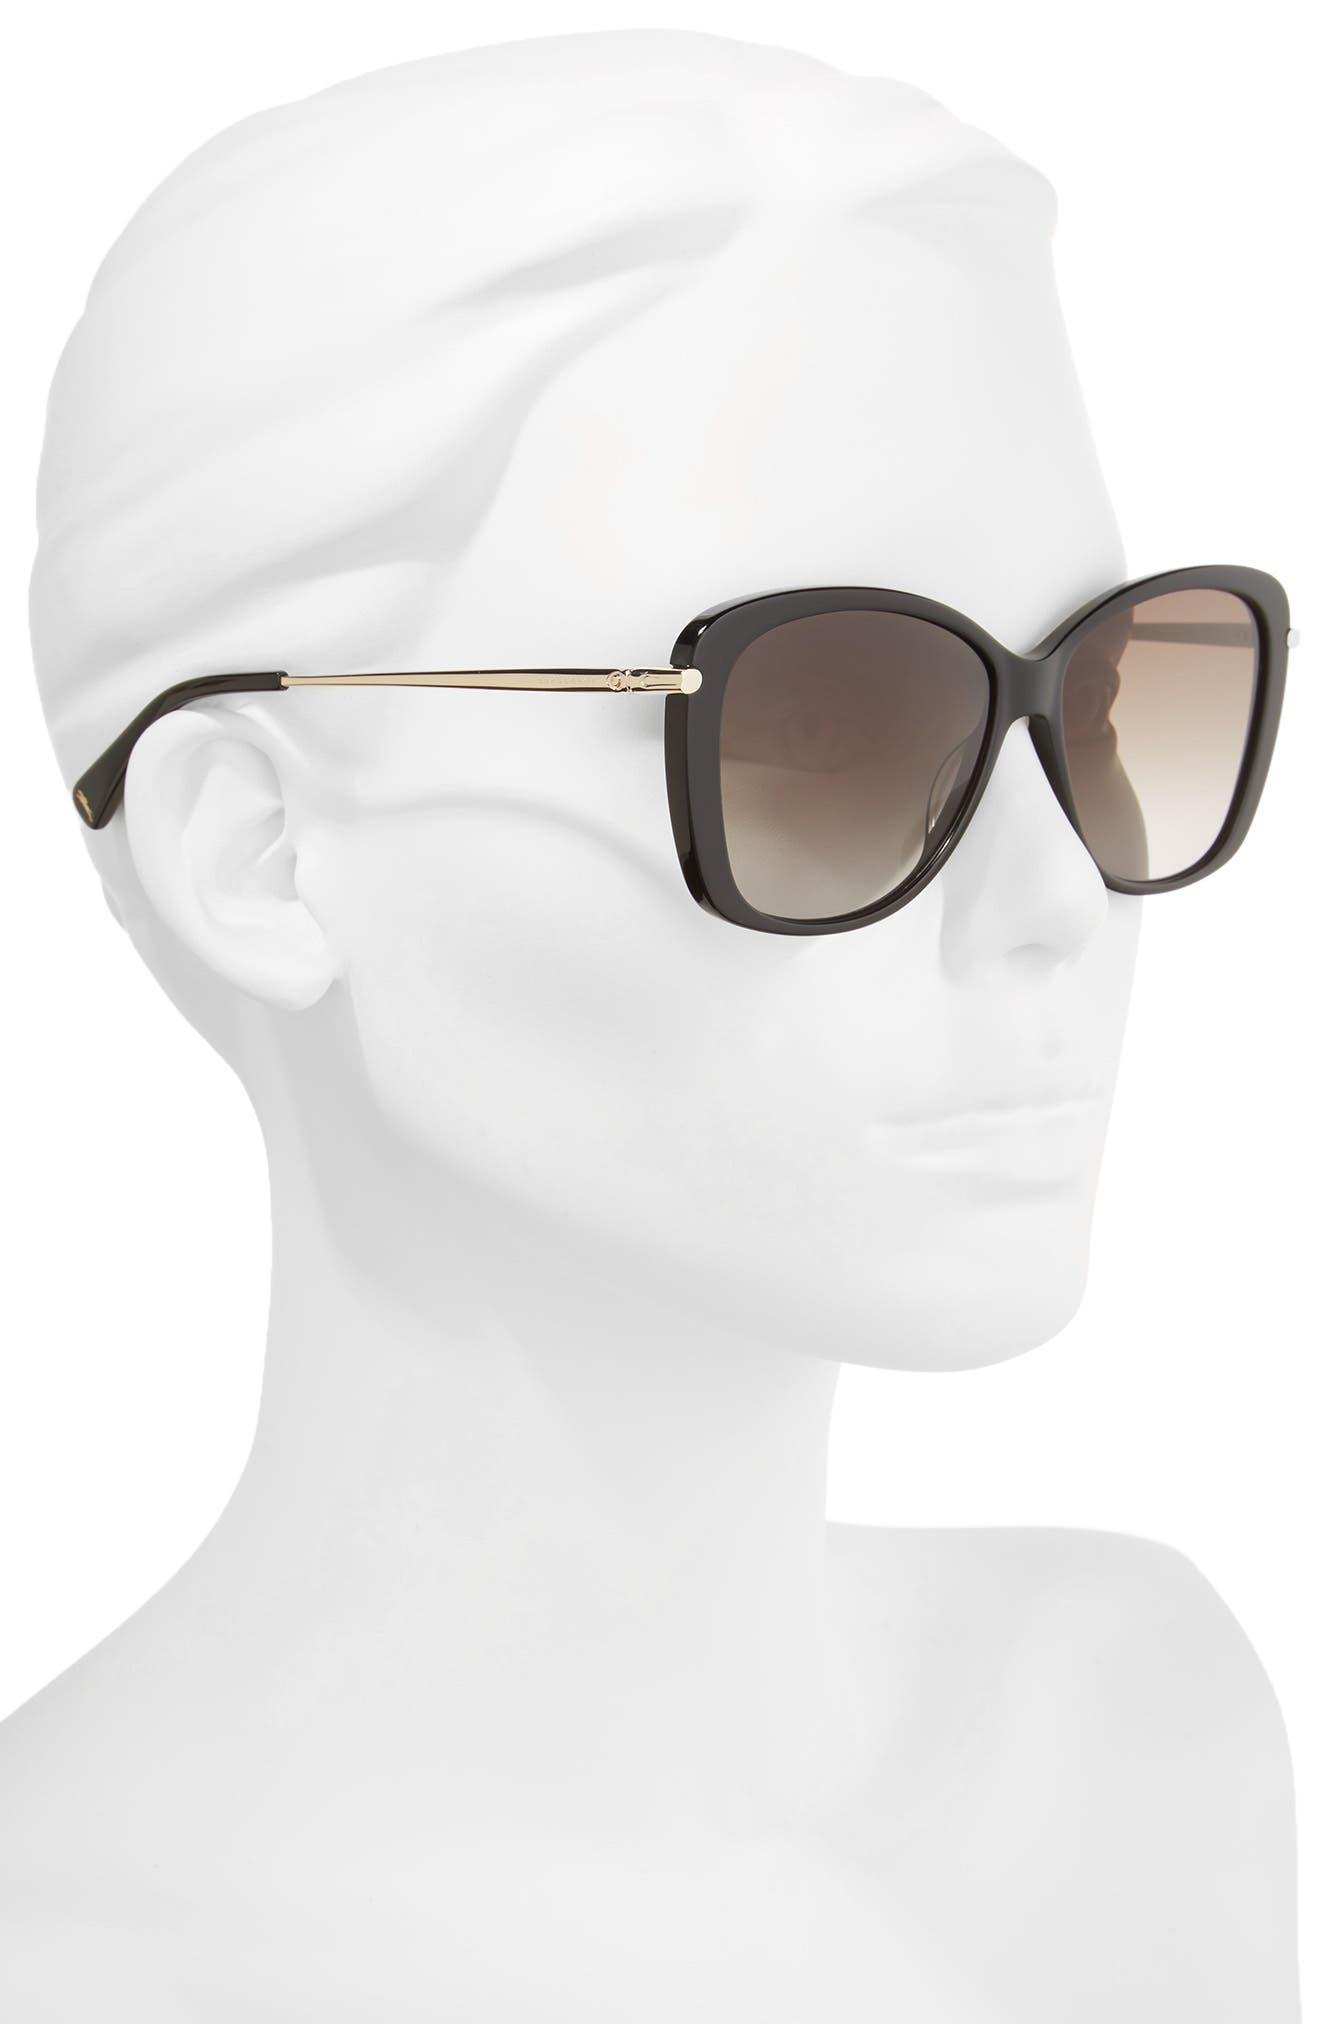 56mm Gradient Lens Butterfly Sunglasses,                             Alternate thumbnail 2, color,                             BLACK